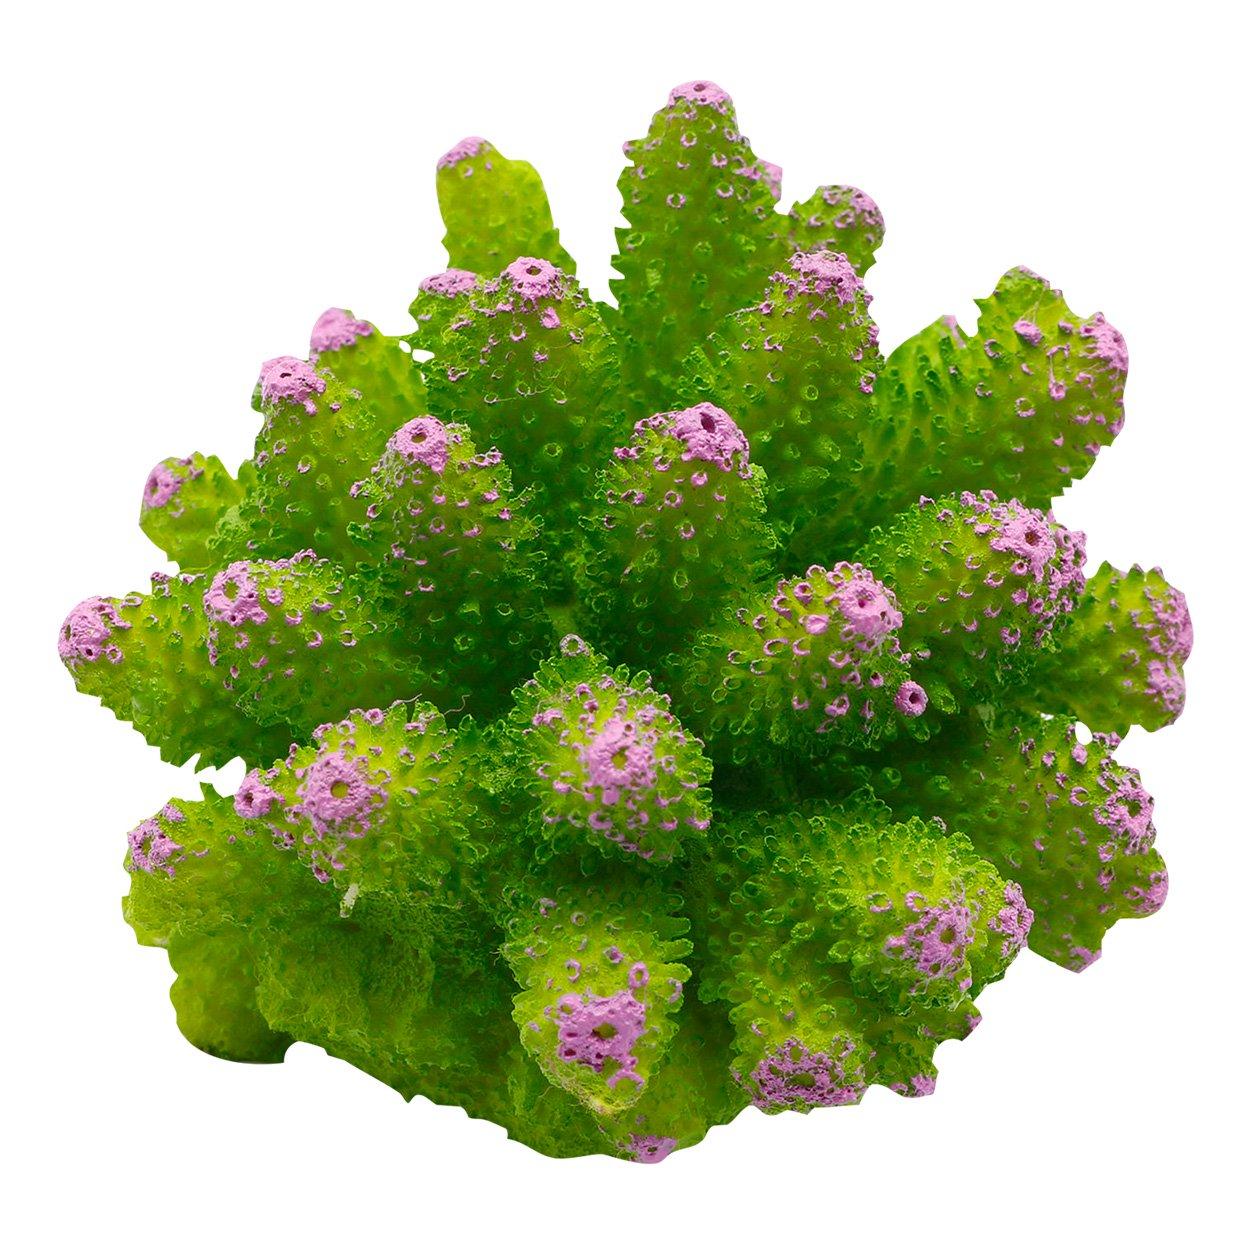 Underwater Treasures Cauliflower Coral - Green